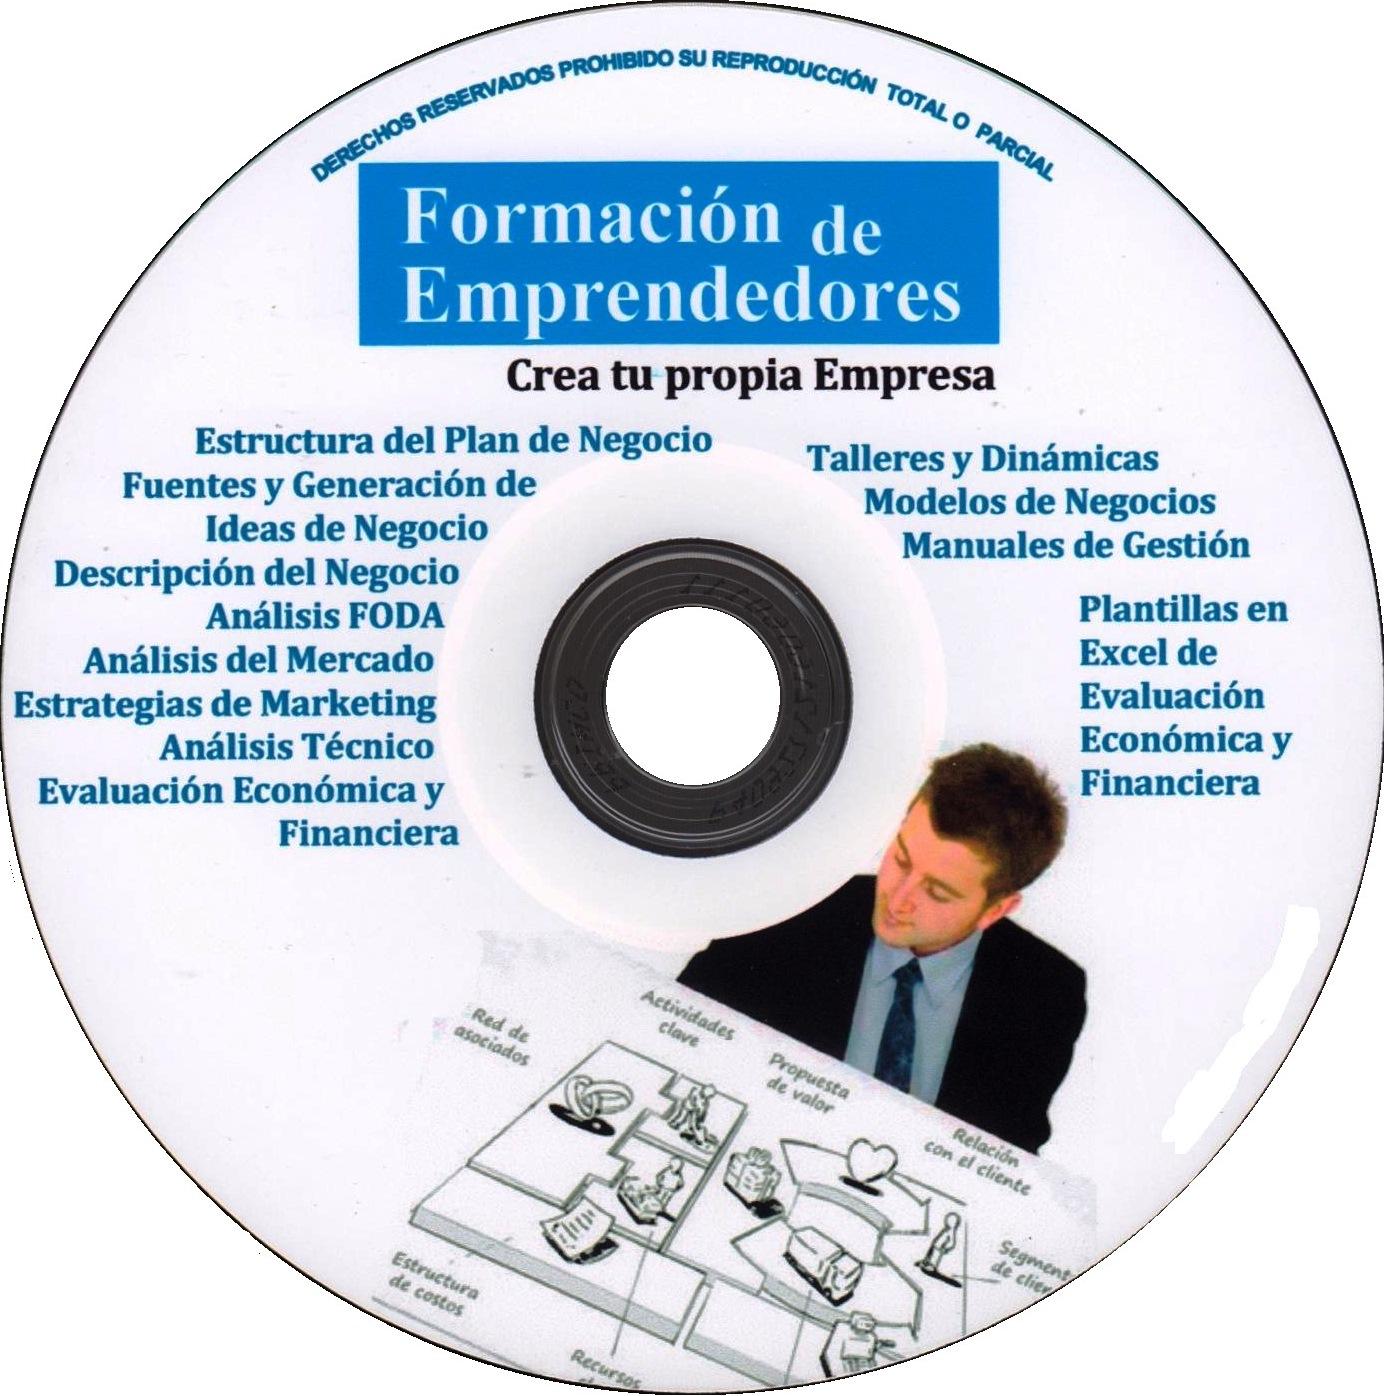 Formación de Emprendedores: Crea tu propia Empresa